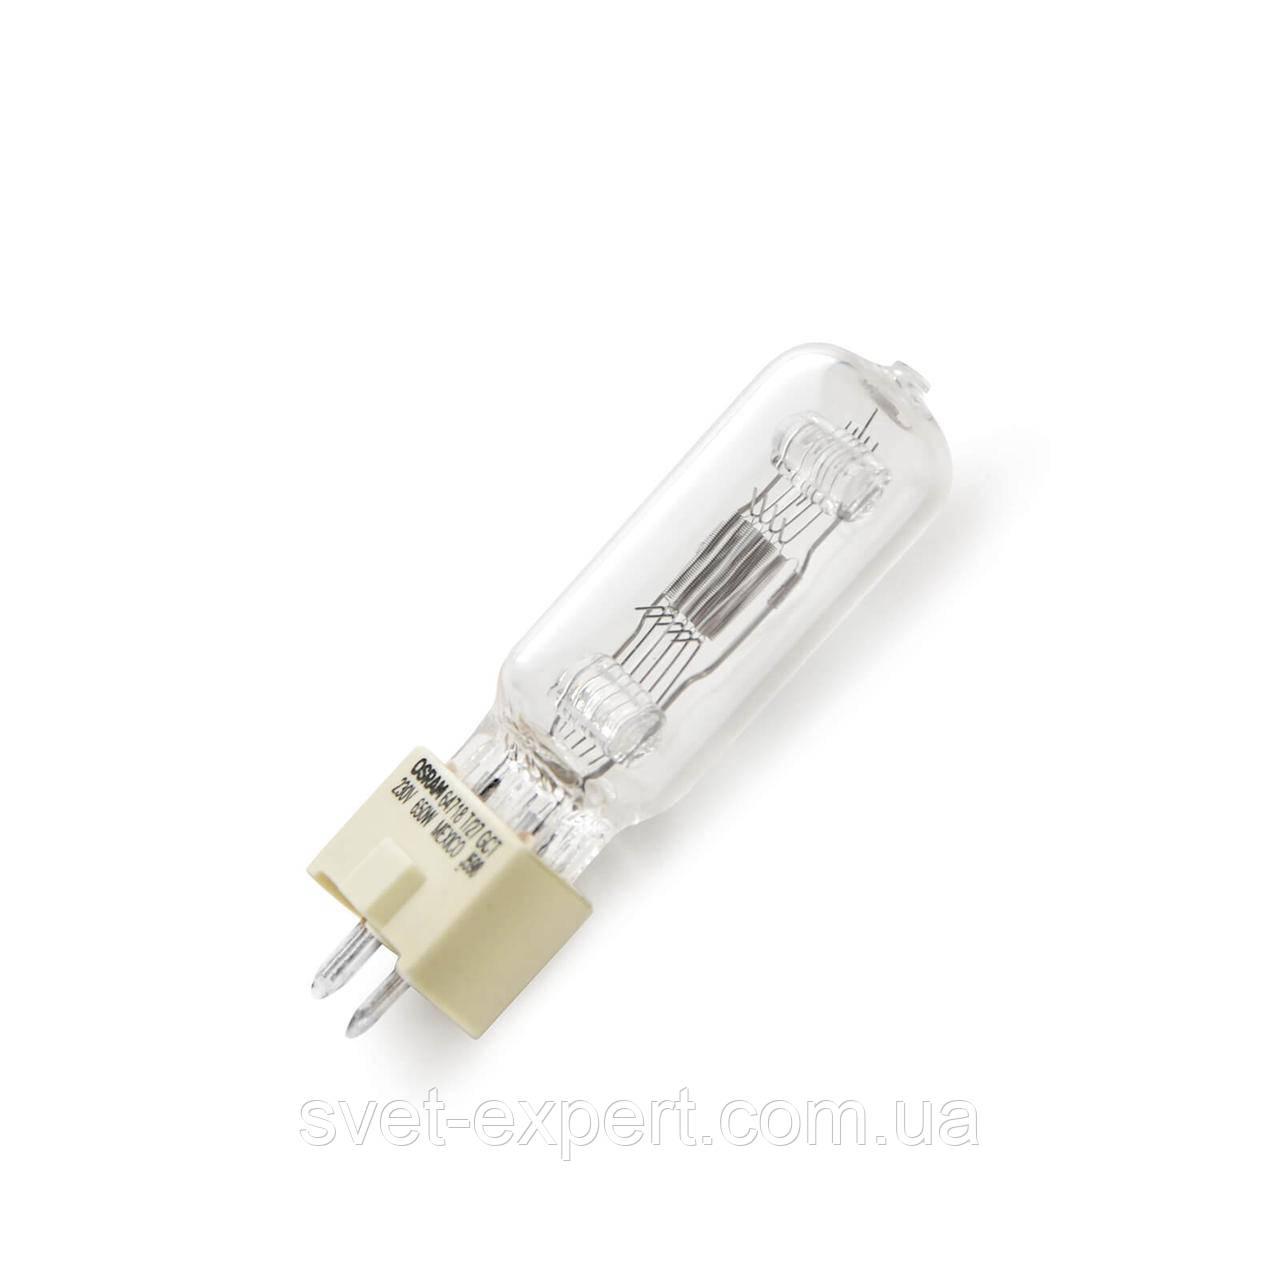 Лампа 64718 T/27 650W 230/240V GY9.5 12x1 OSRAM